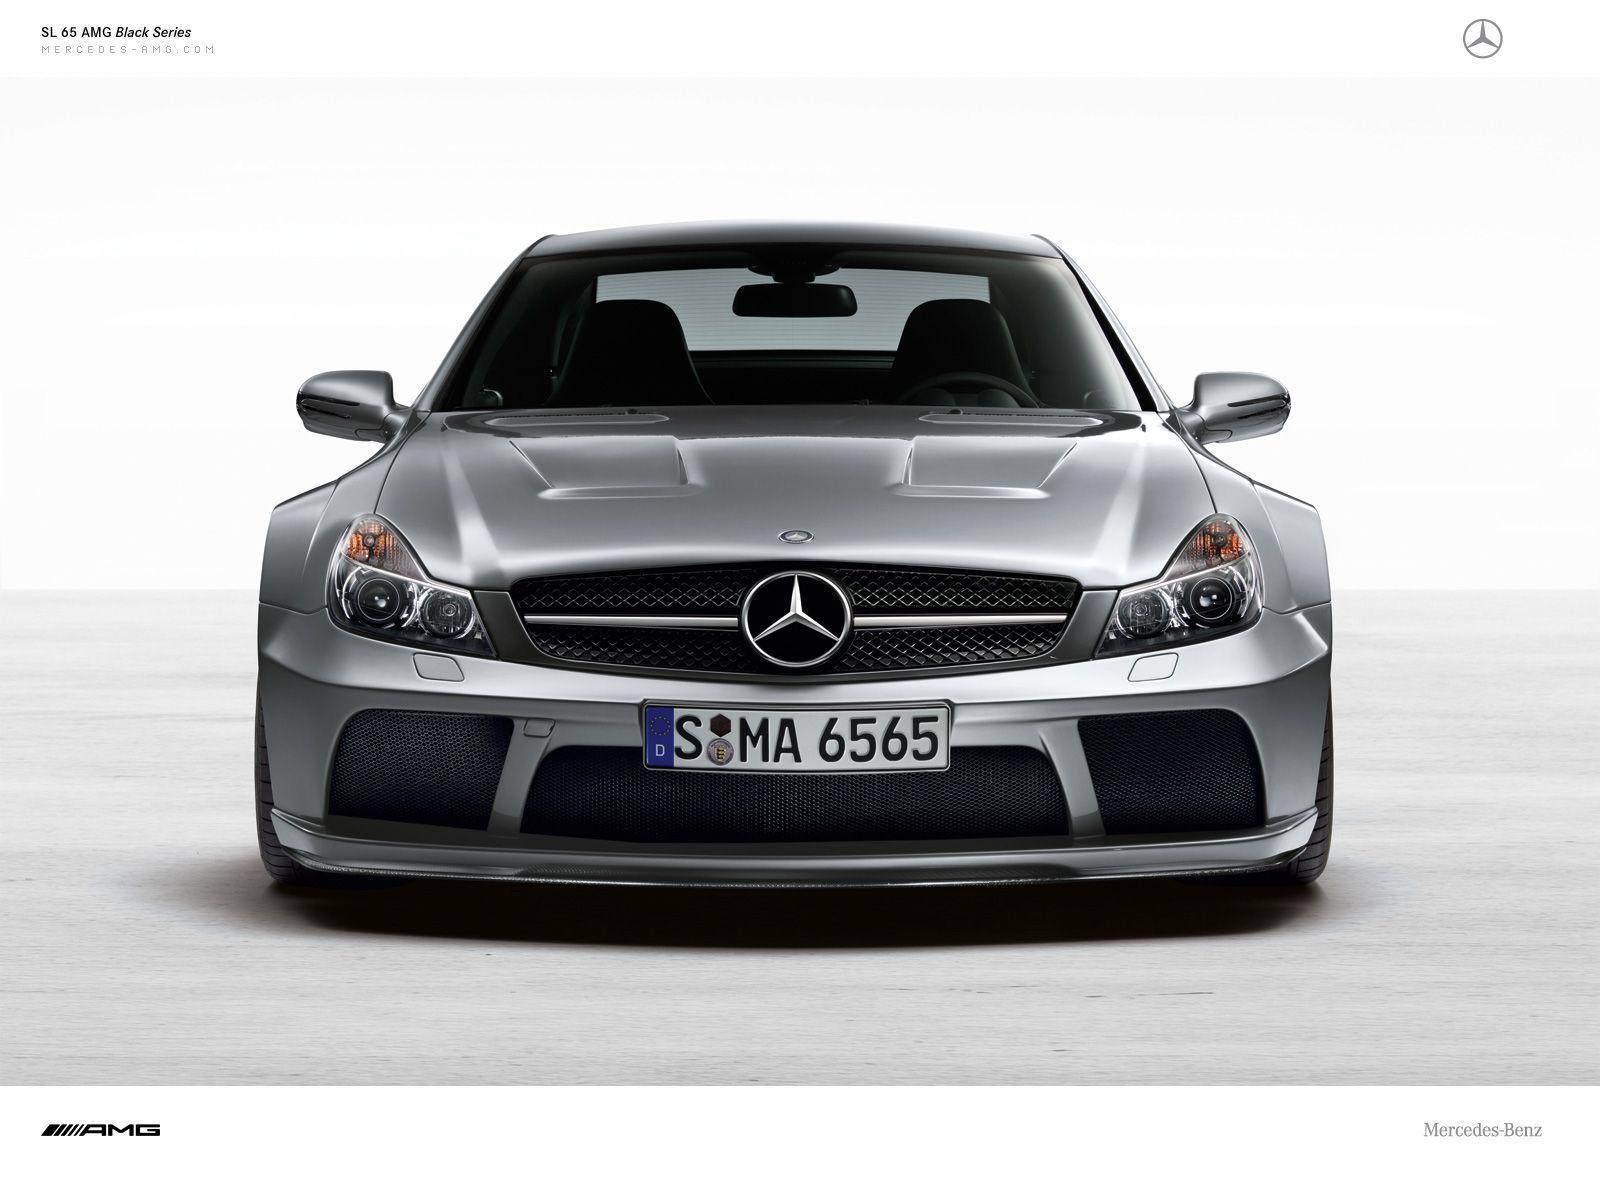 mercedes amg sl black series wallpaper mercedes benz tuning - Mercedes Benz C63 Amg Black Series Wallpaper